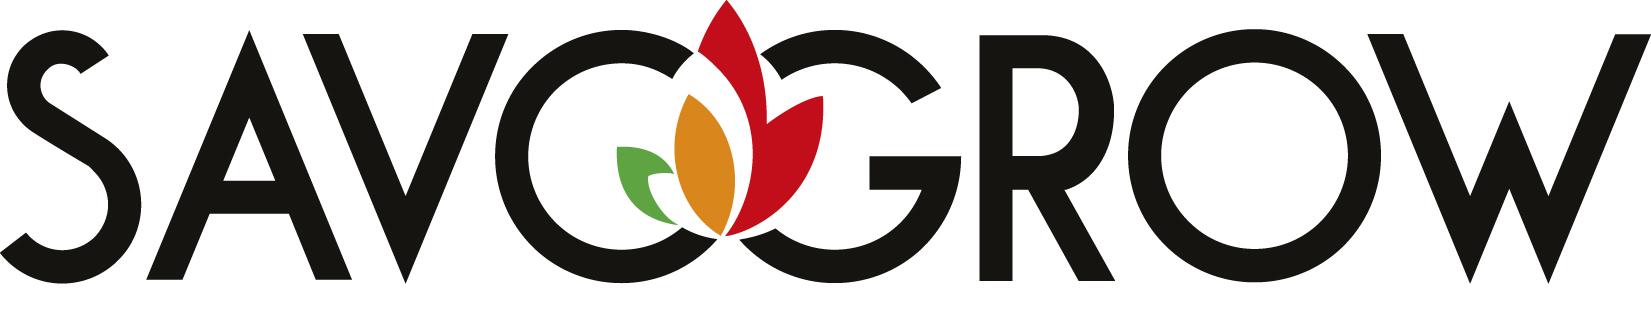 Savogrow-logo-ei-kuntia